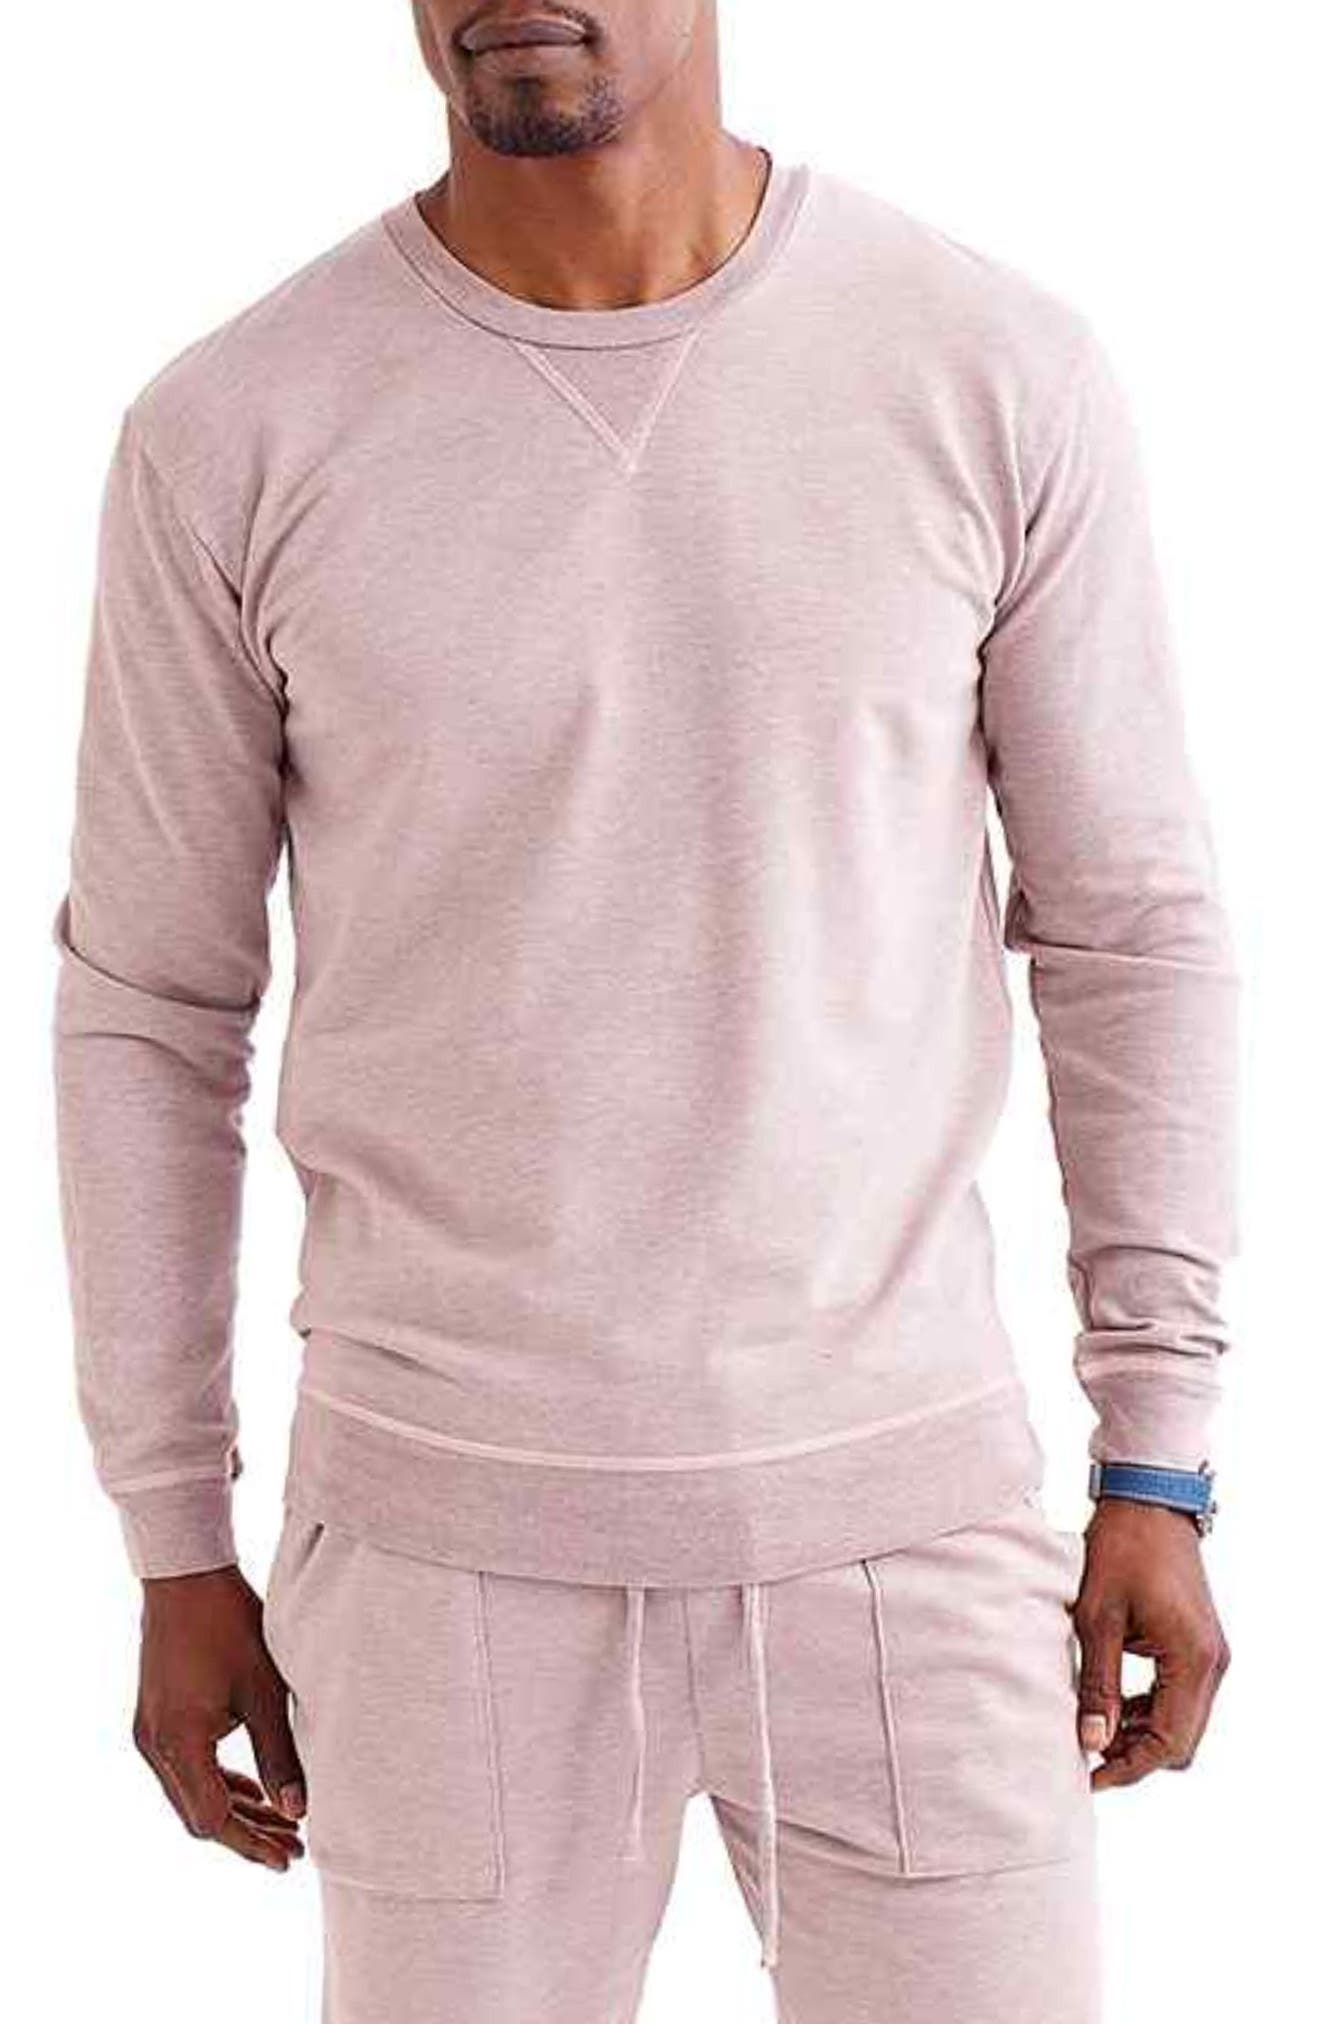 Men's Slim Micro Terry Crewneck Sweatshirt